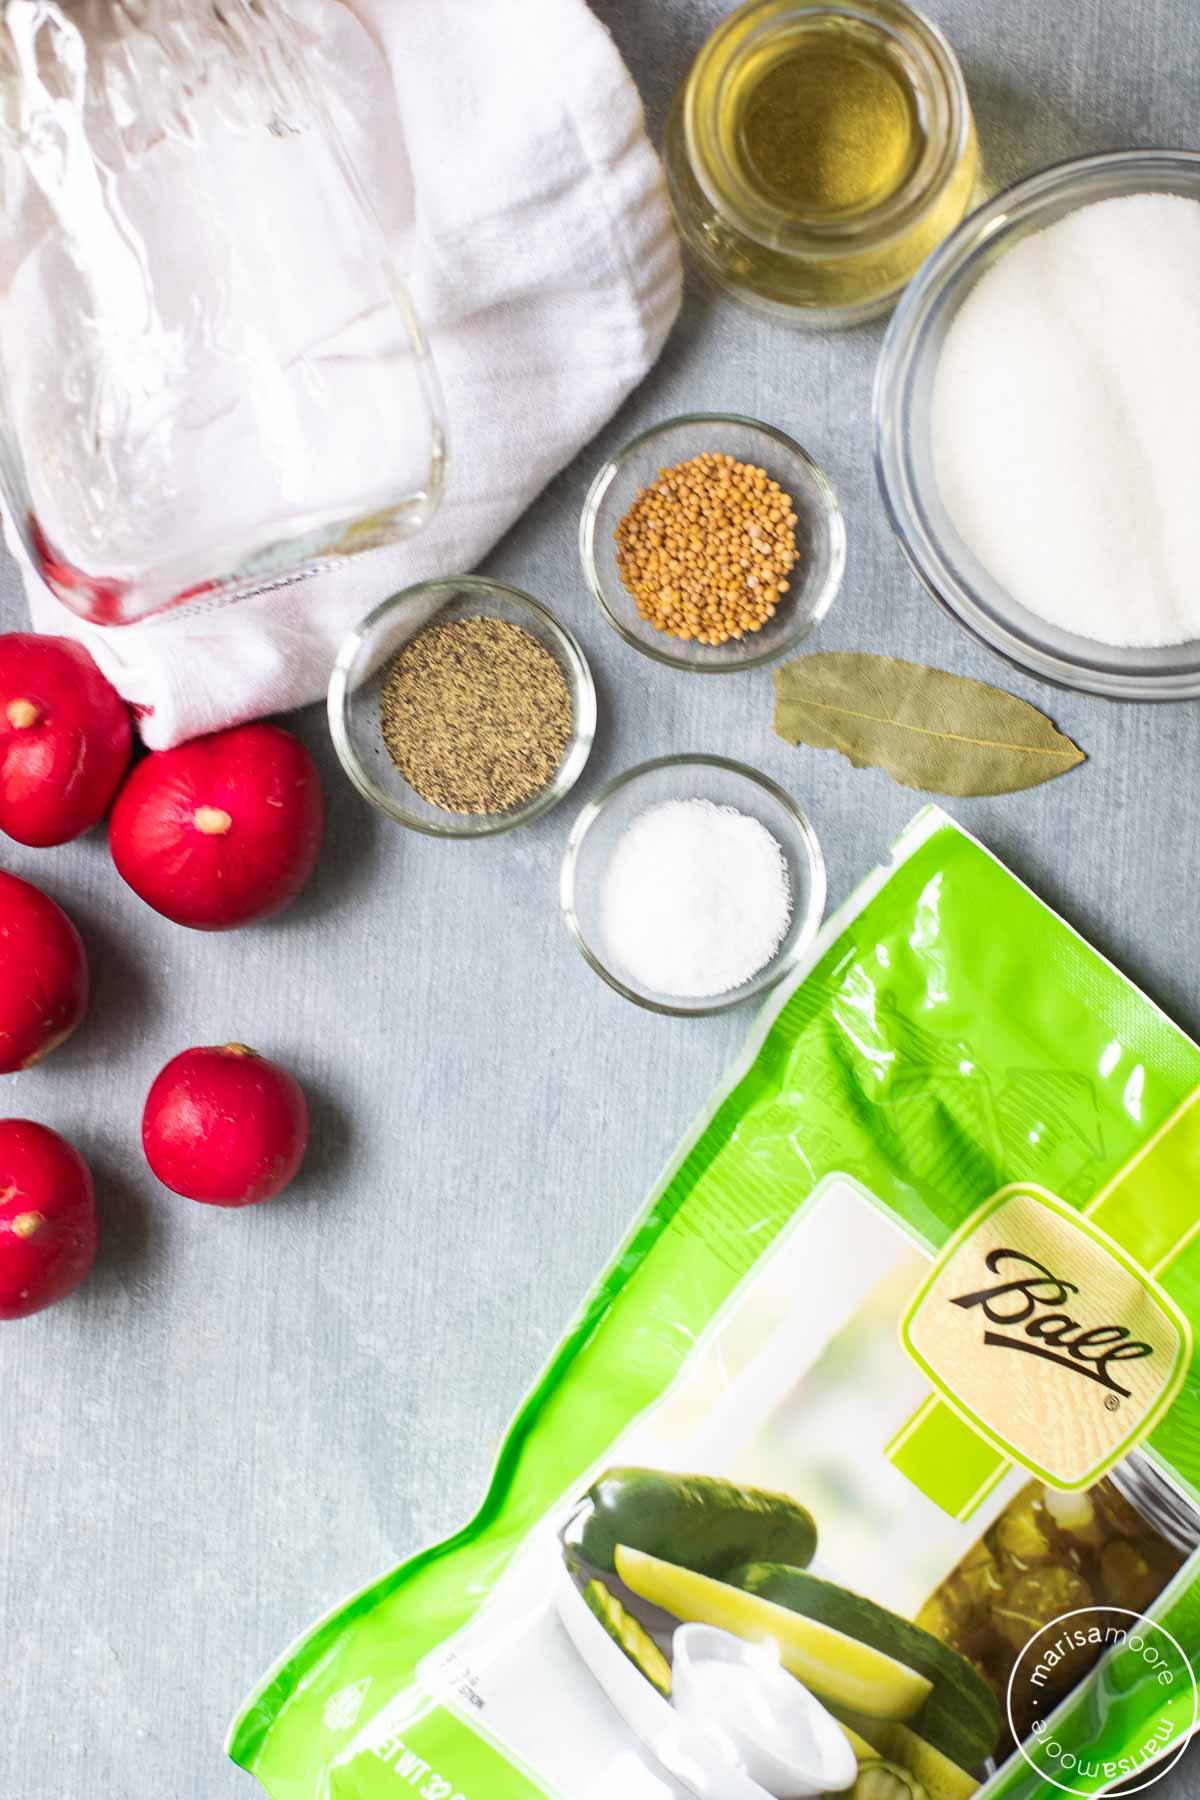 radishes, pickling salt, sugar, vinegar, and spices on a grey board